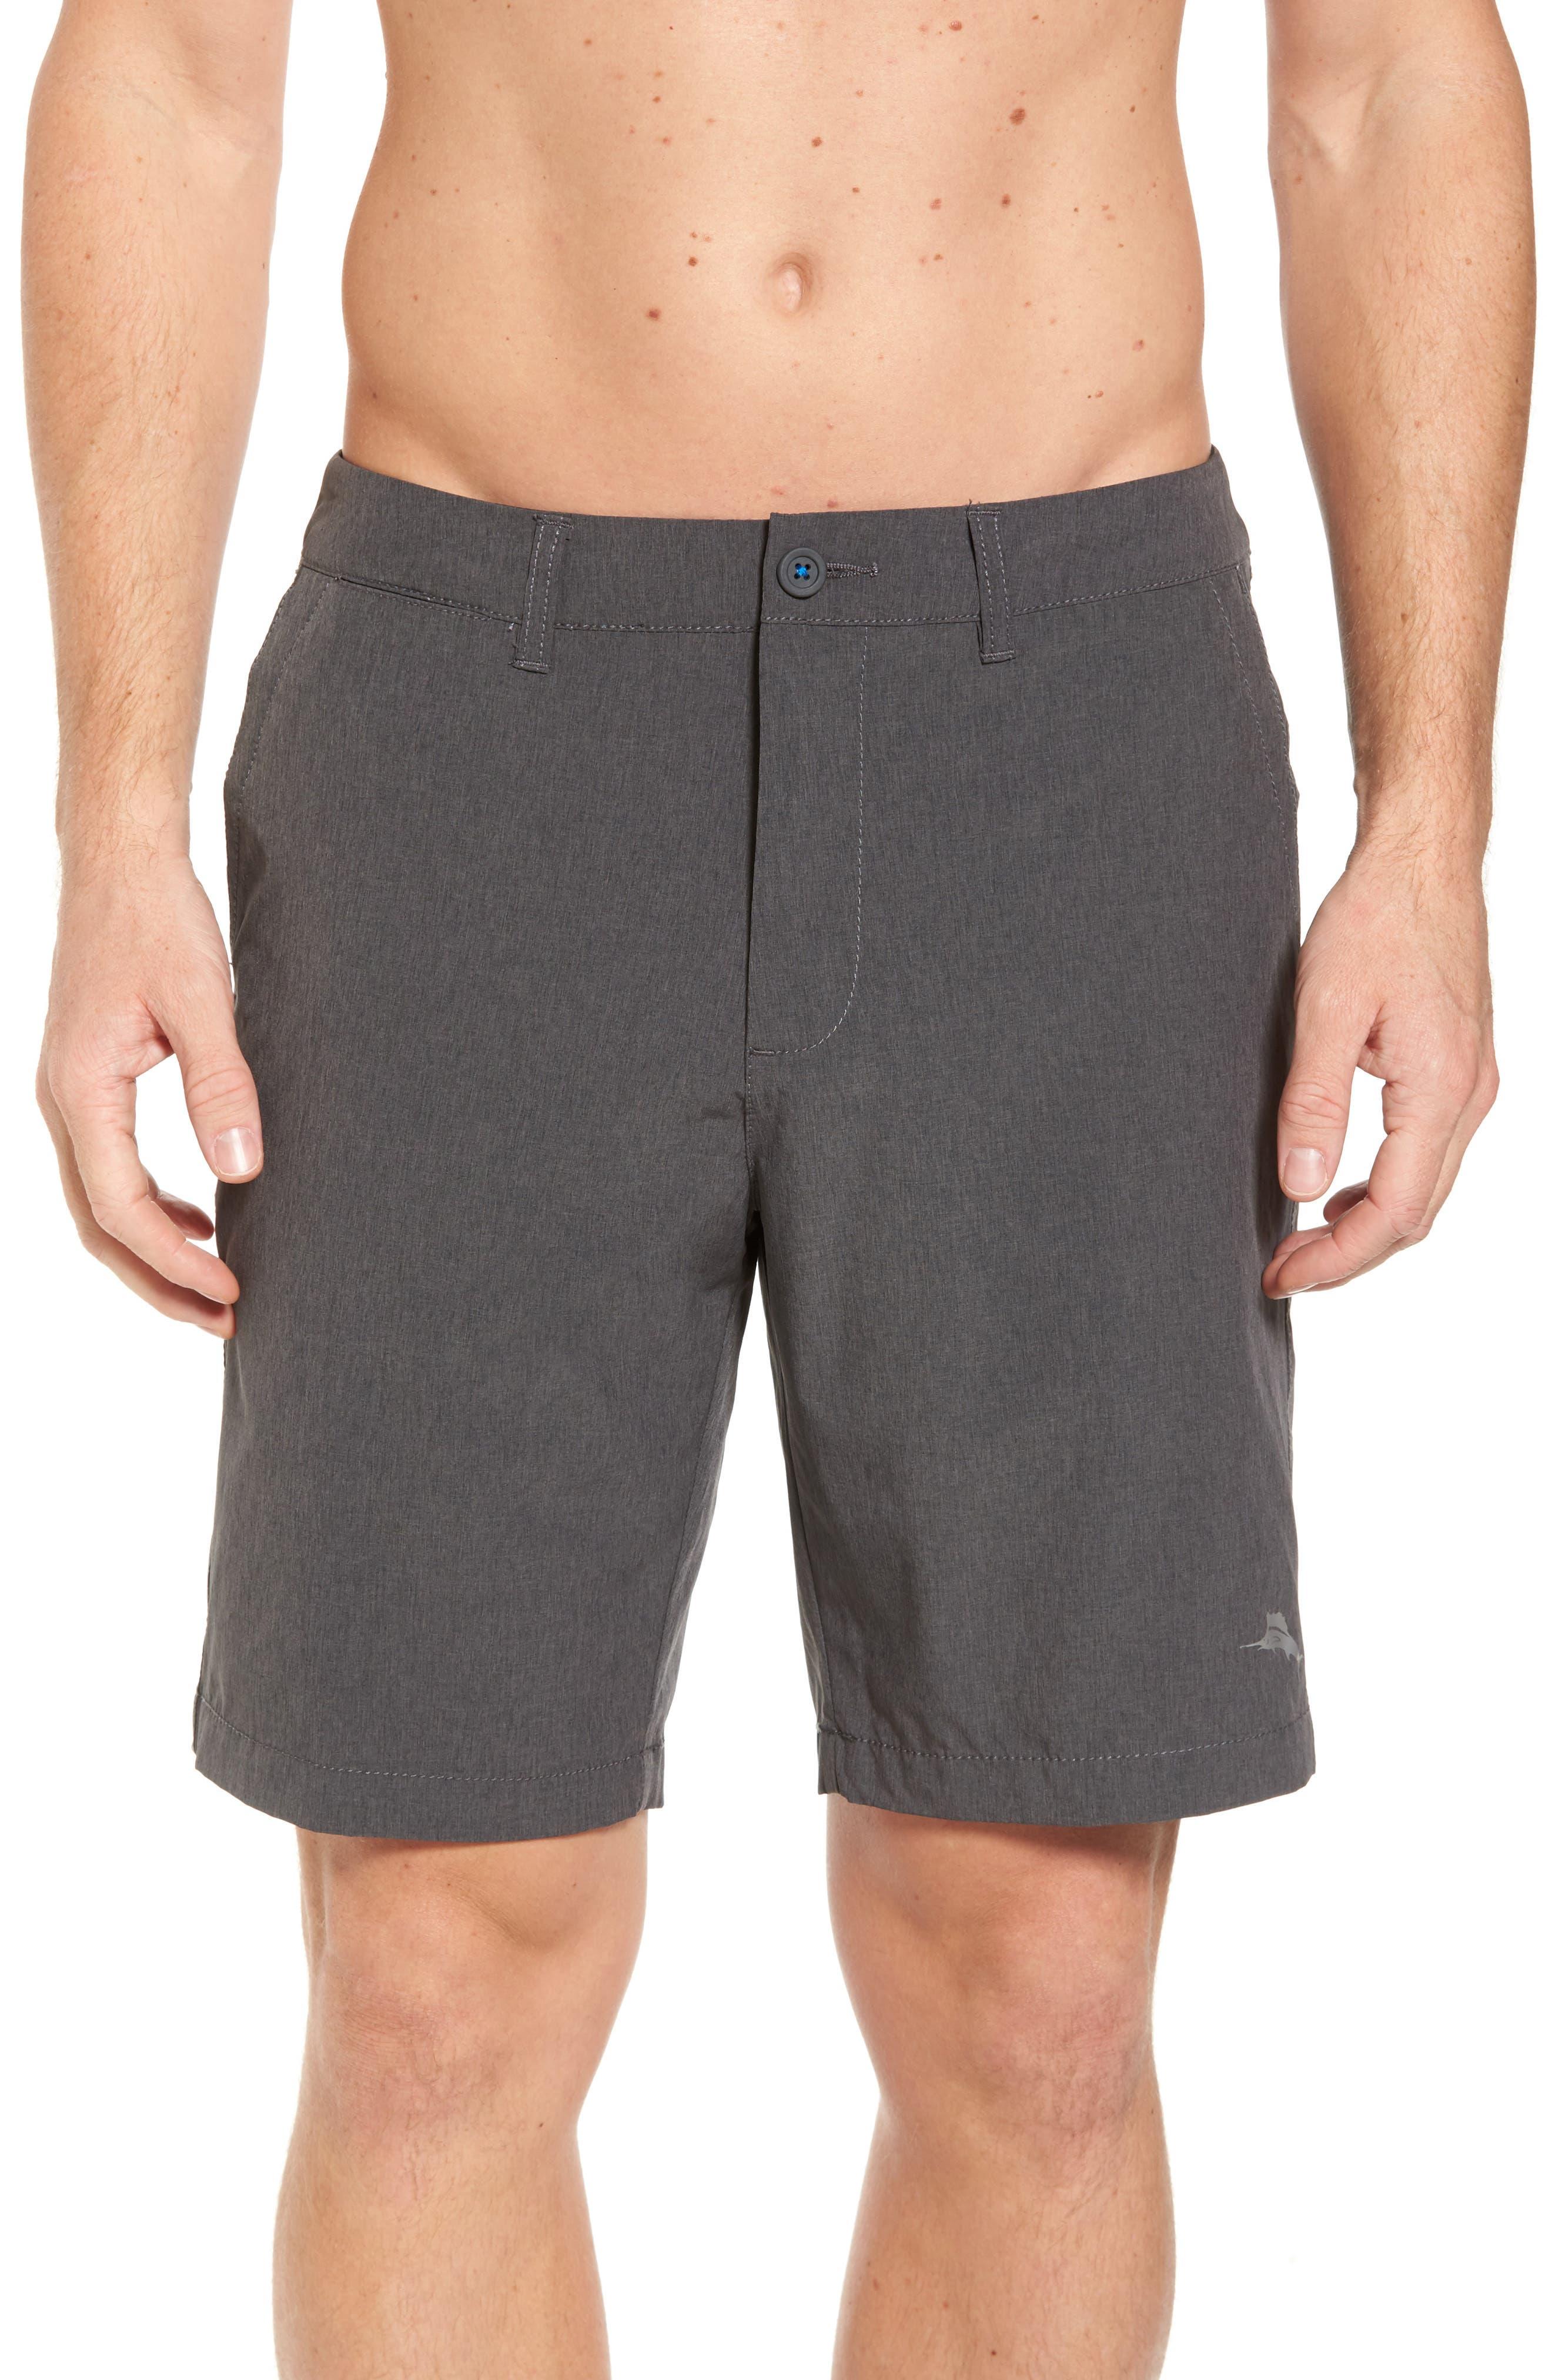 Tommy Bahama Cayman Isles Hybrid Shorts